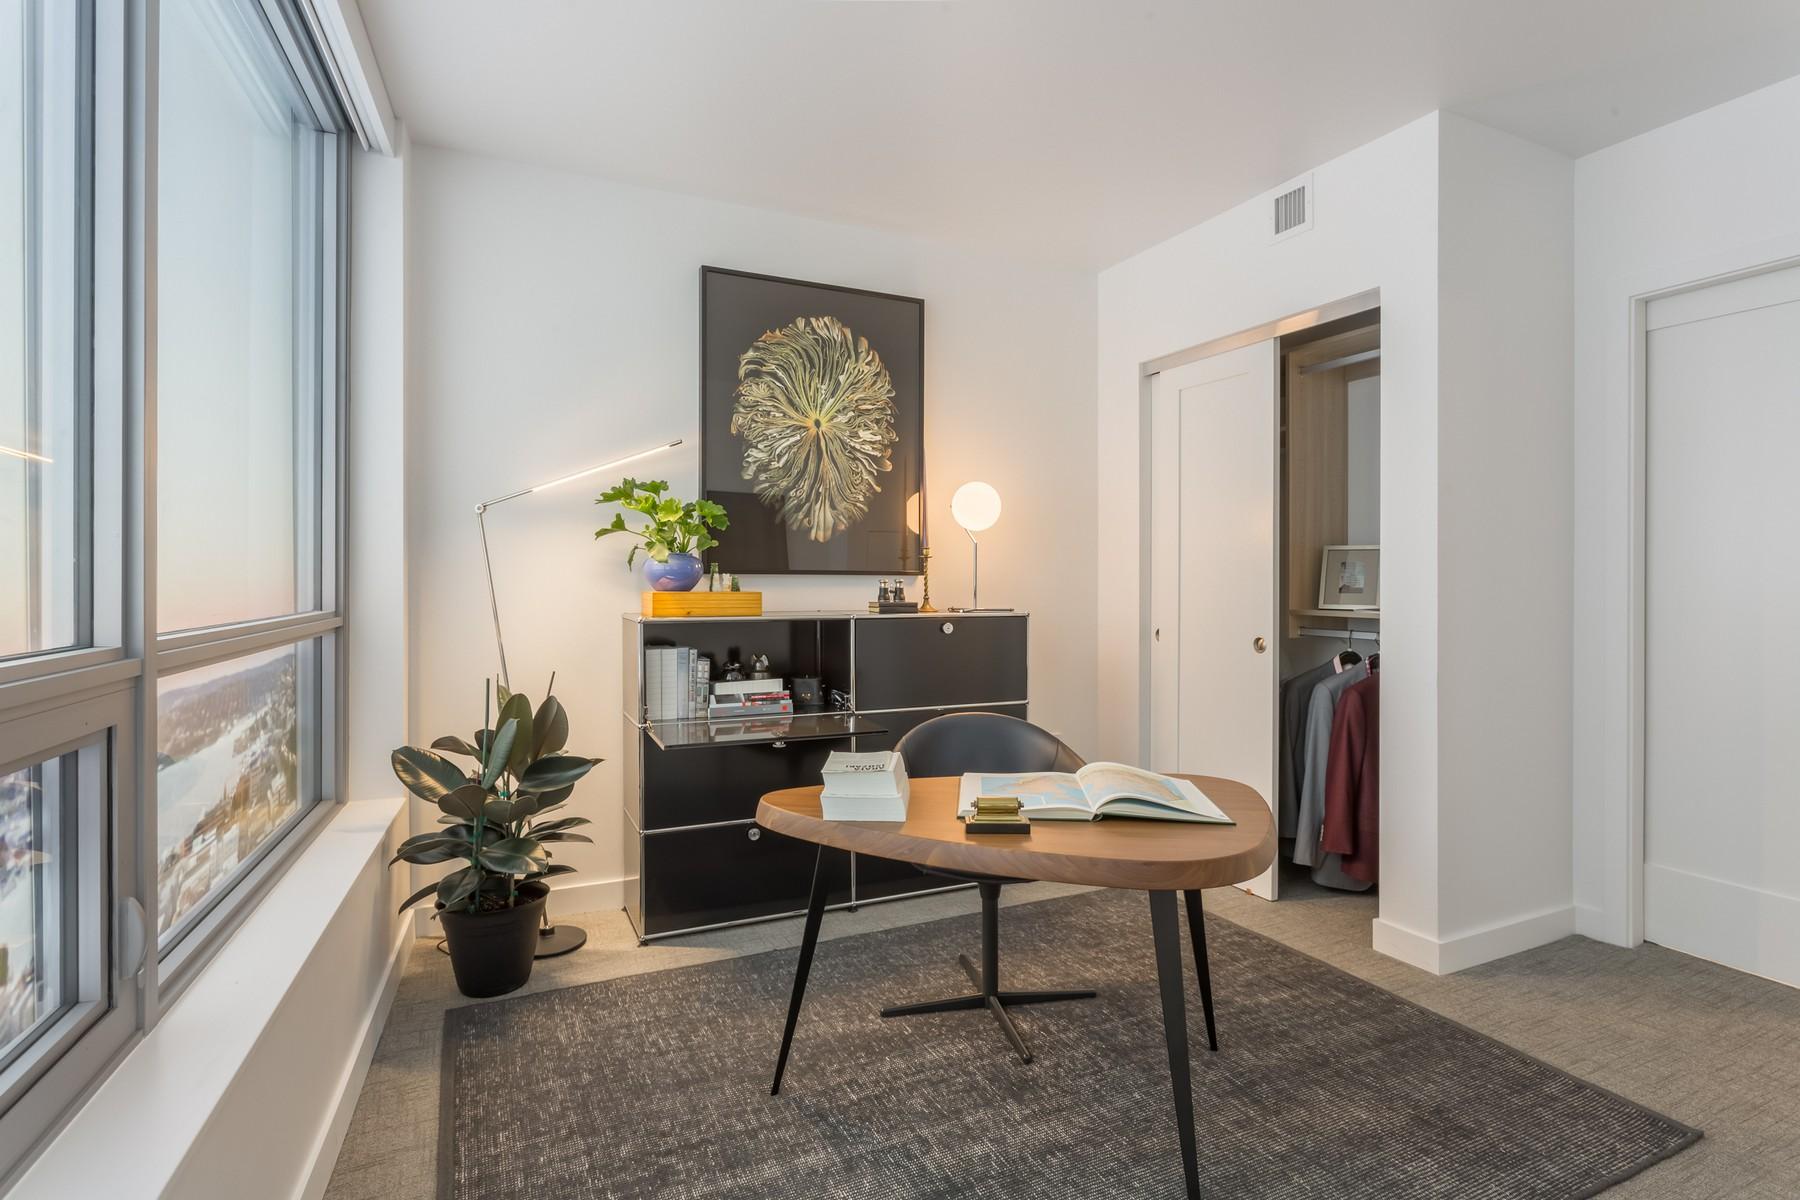 Additional photo for property listing at Nexus #3702 1200 Howell #3702 Seattle, Washington 98101 United States